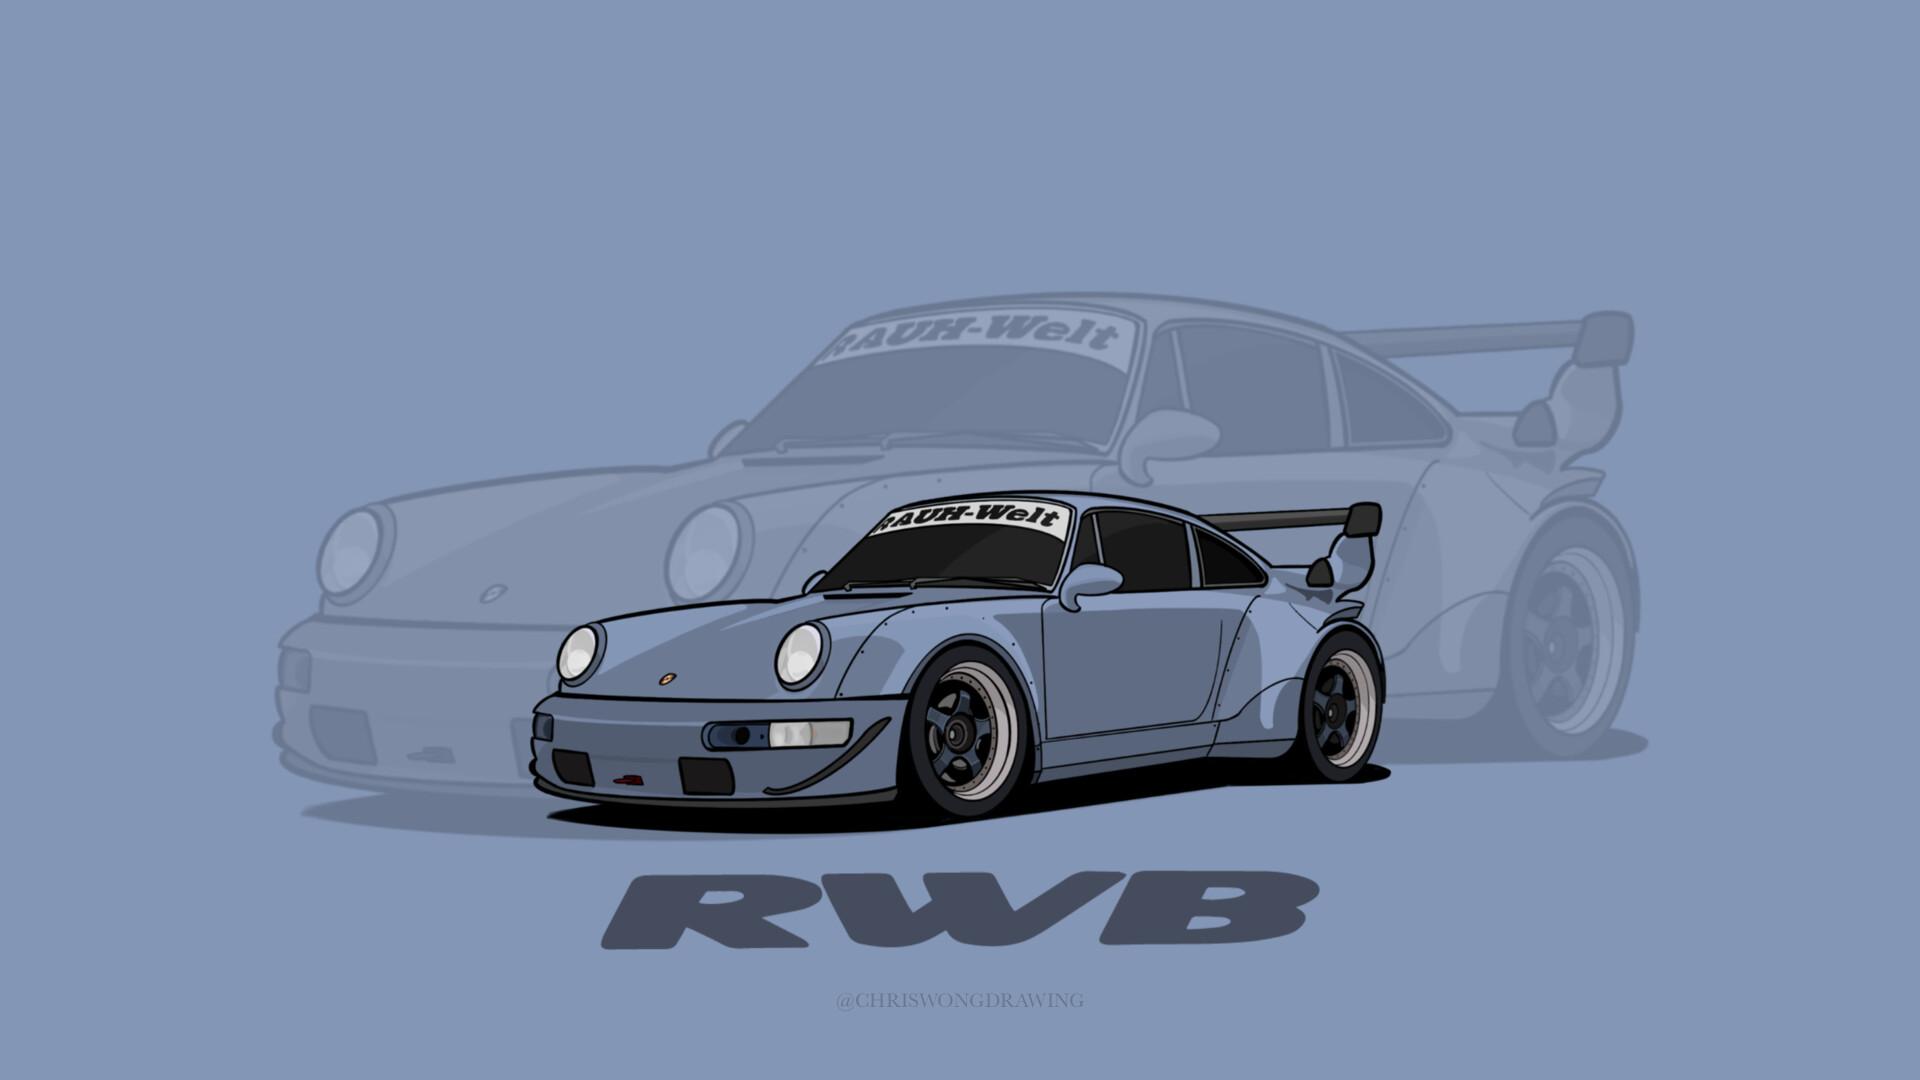 Artstation Rwb Porsche Illustration Wallpaper 1920x1080 C W